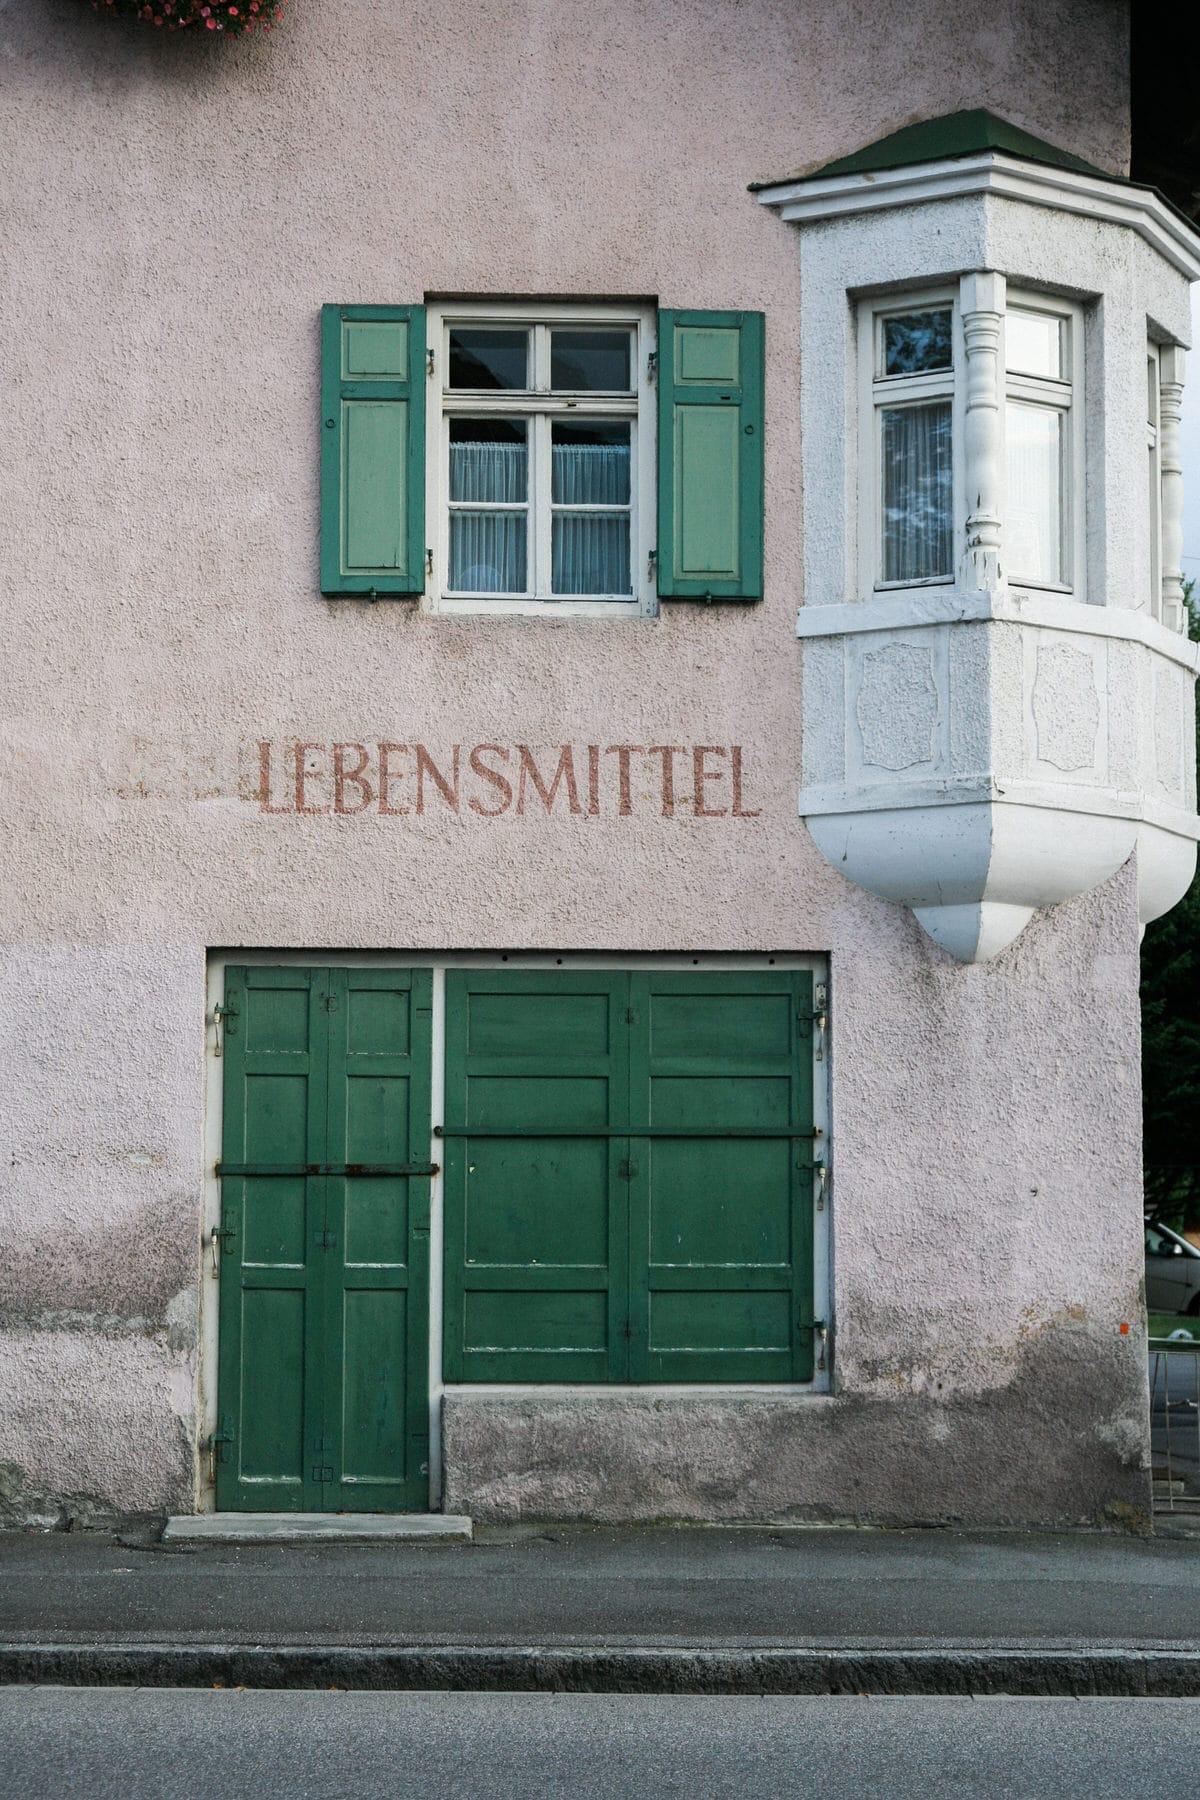 Garmisch_Germany-black-and-white-fine-art-photography-by-Studio-L-photographer-Laura-Schneider-_3677